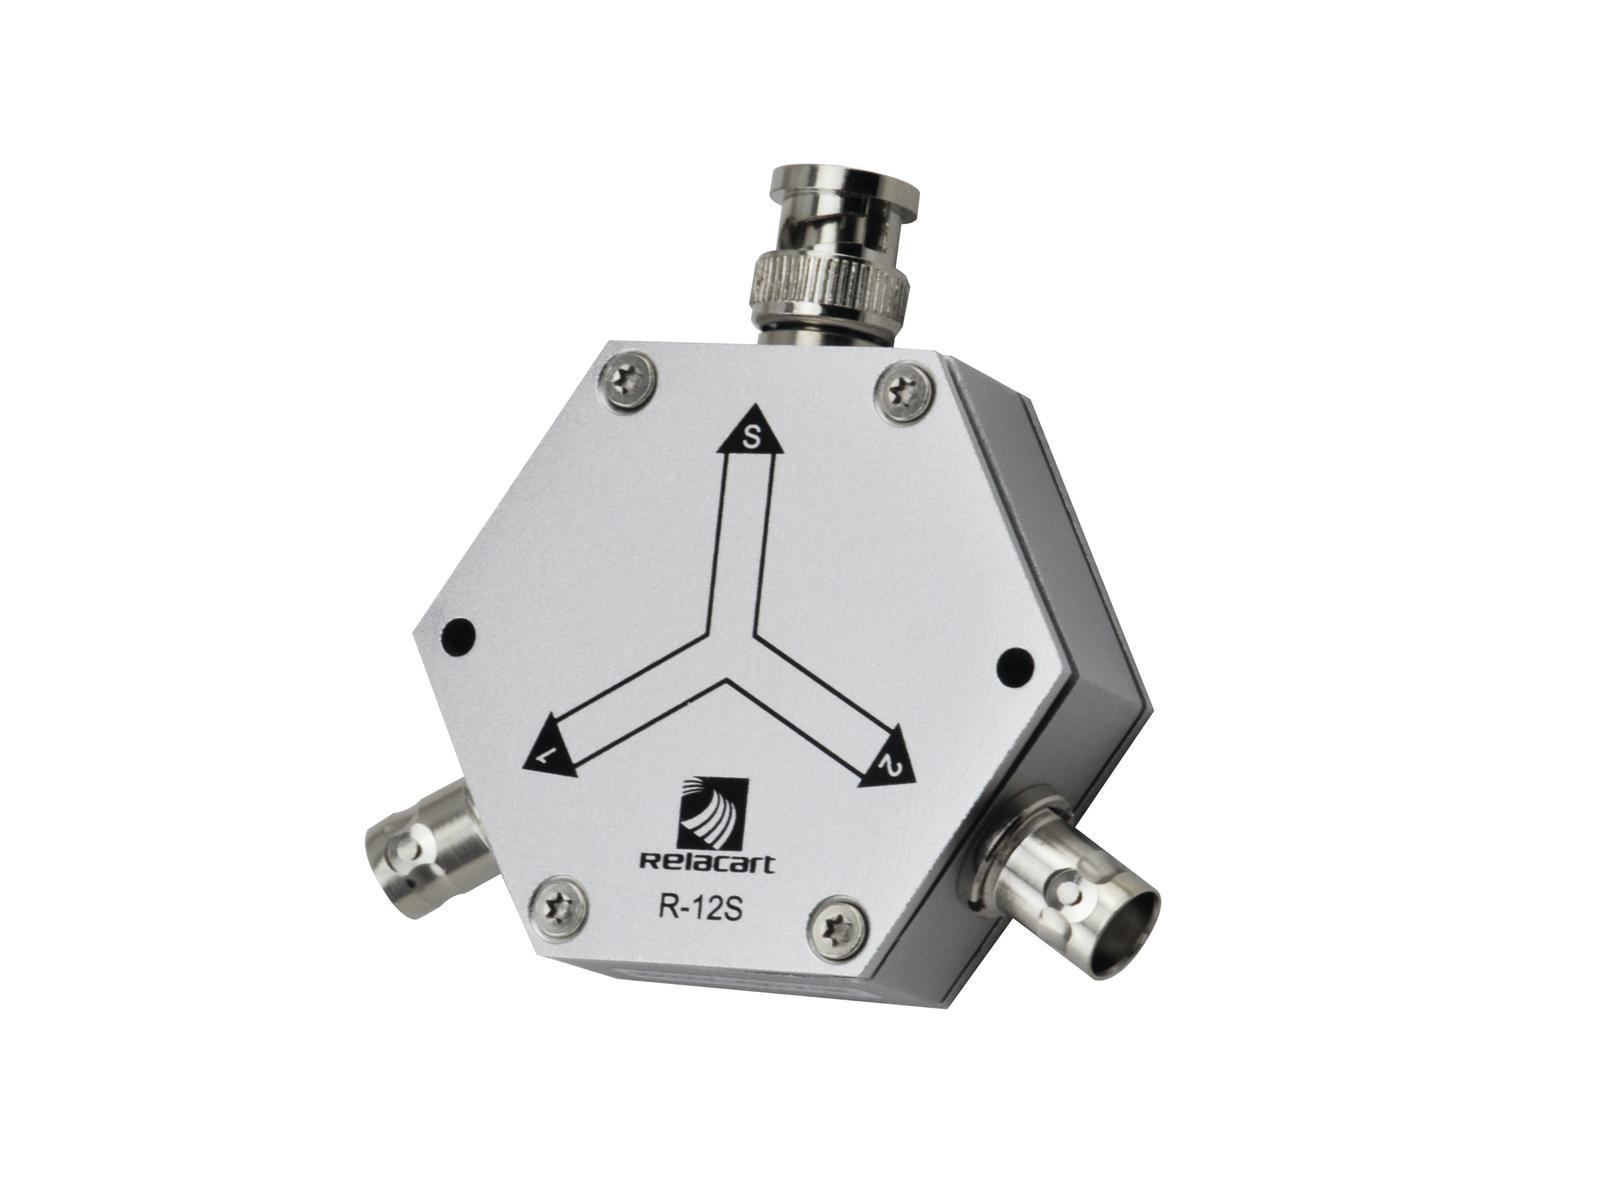 RELACART R-12S Antennenverteiler/Hub